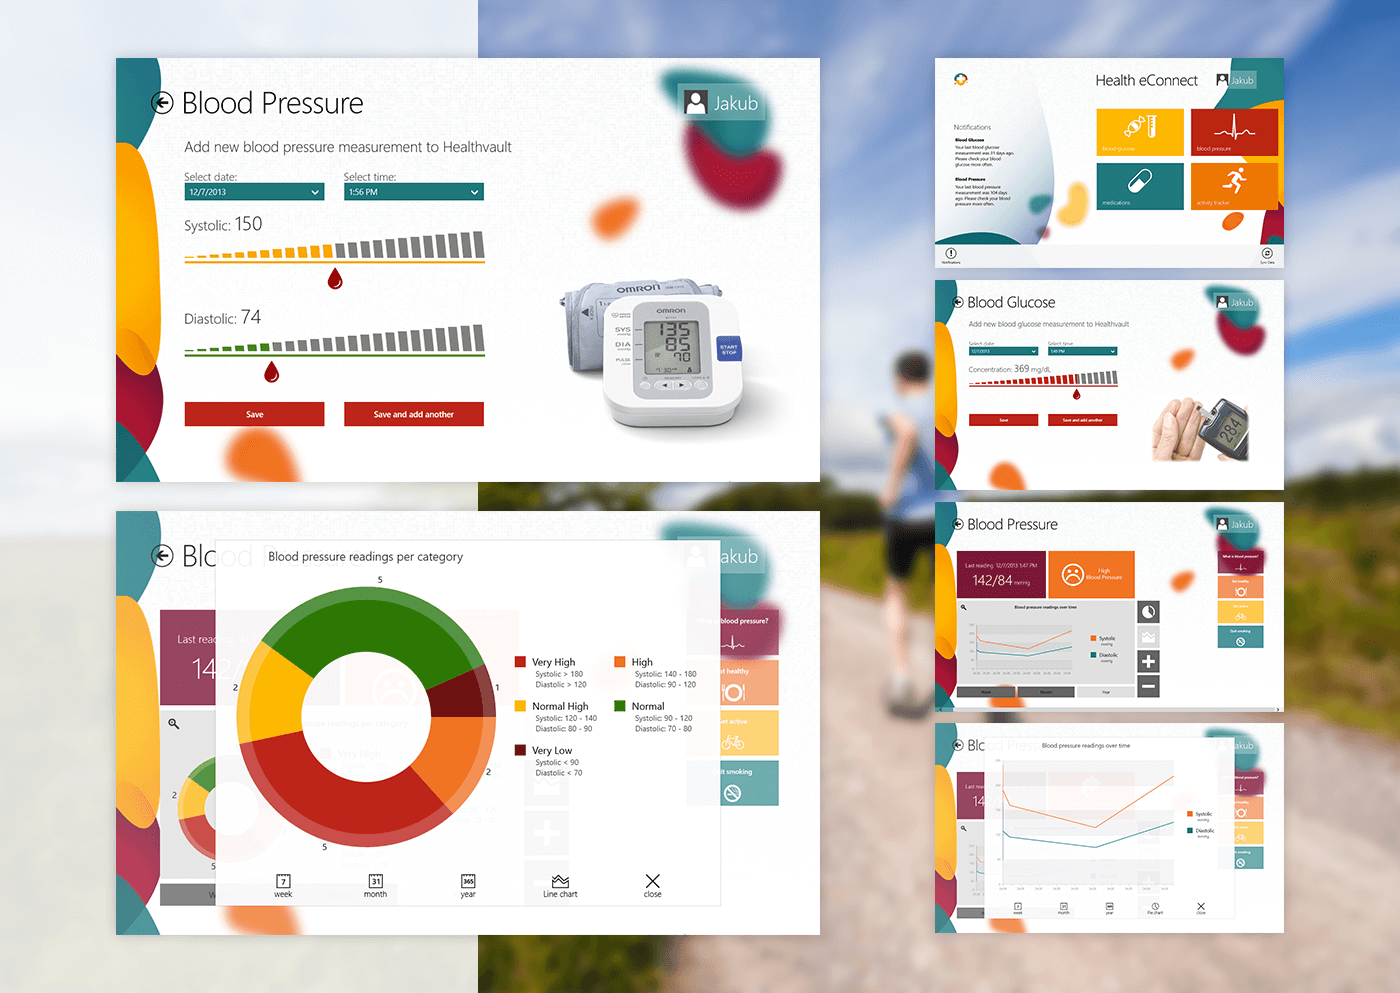 Health medical Microsoft healthvault windows winner application software